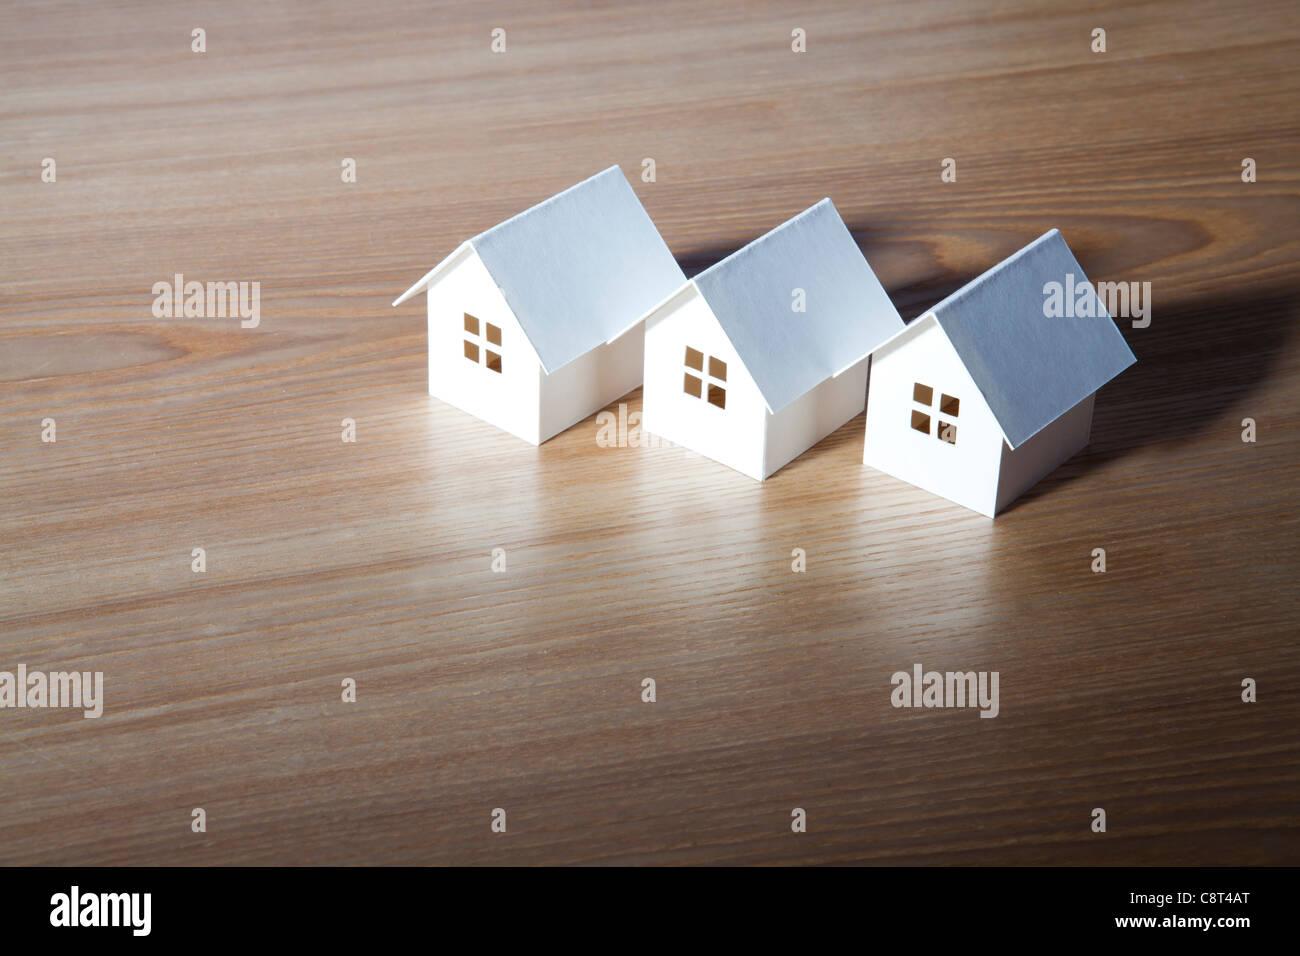 Three white model home kept on table - Stock Image